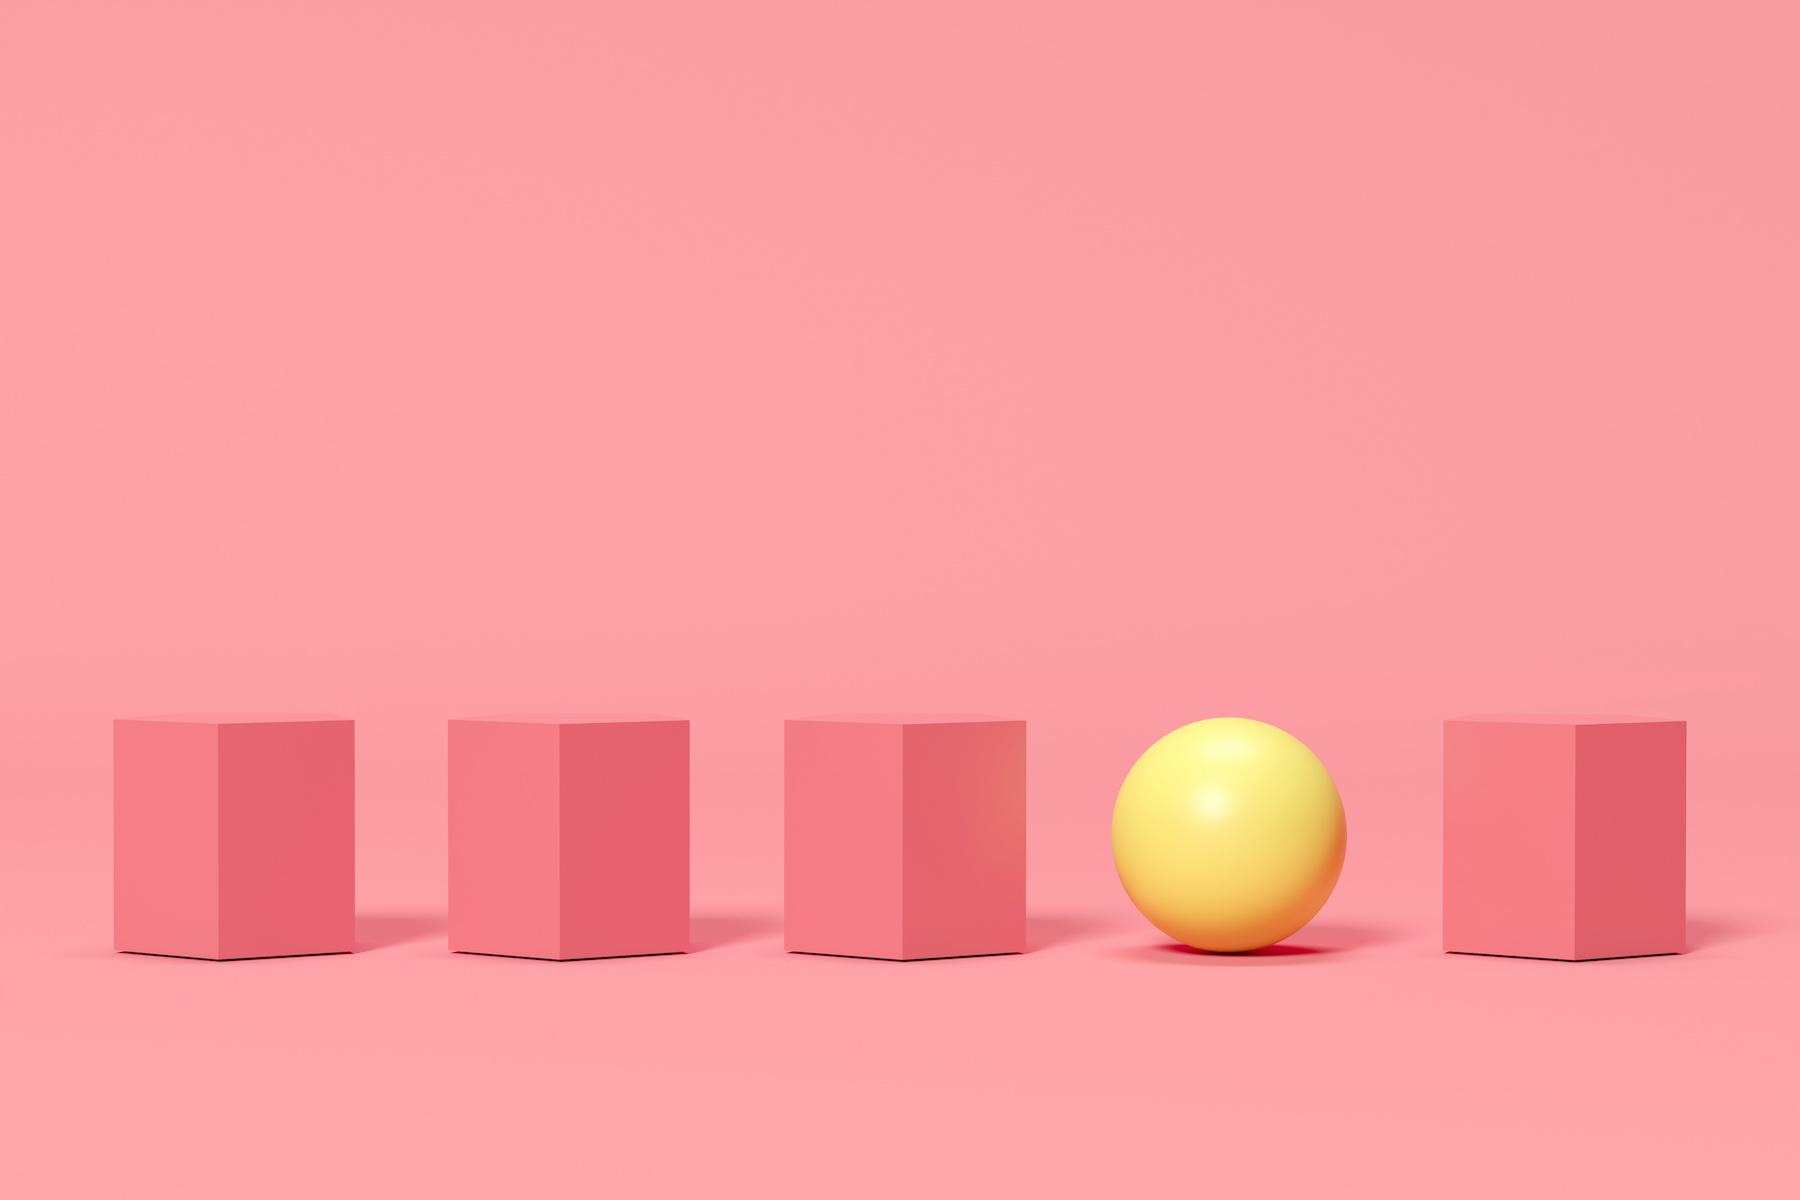 Cube - cercle